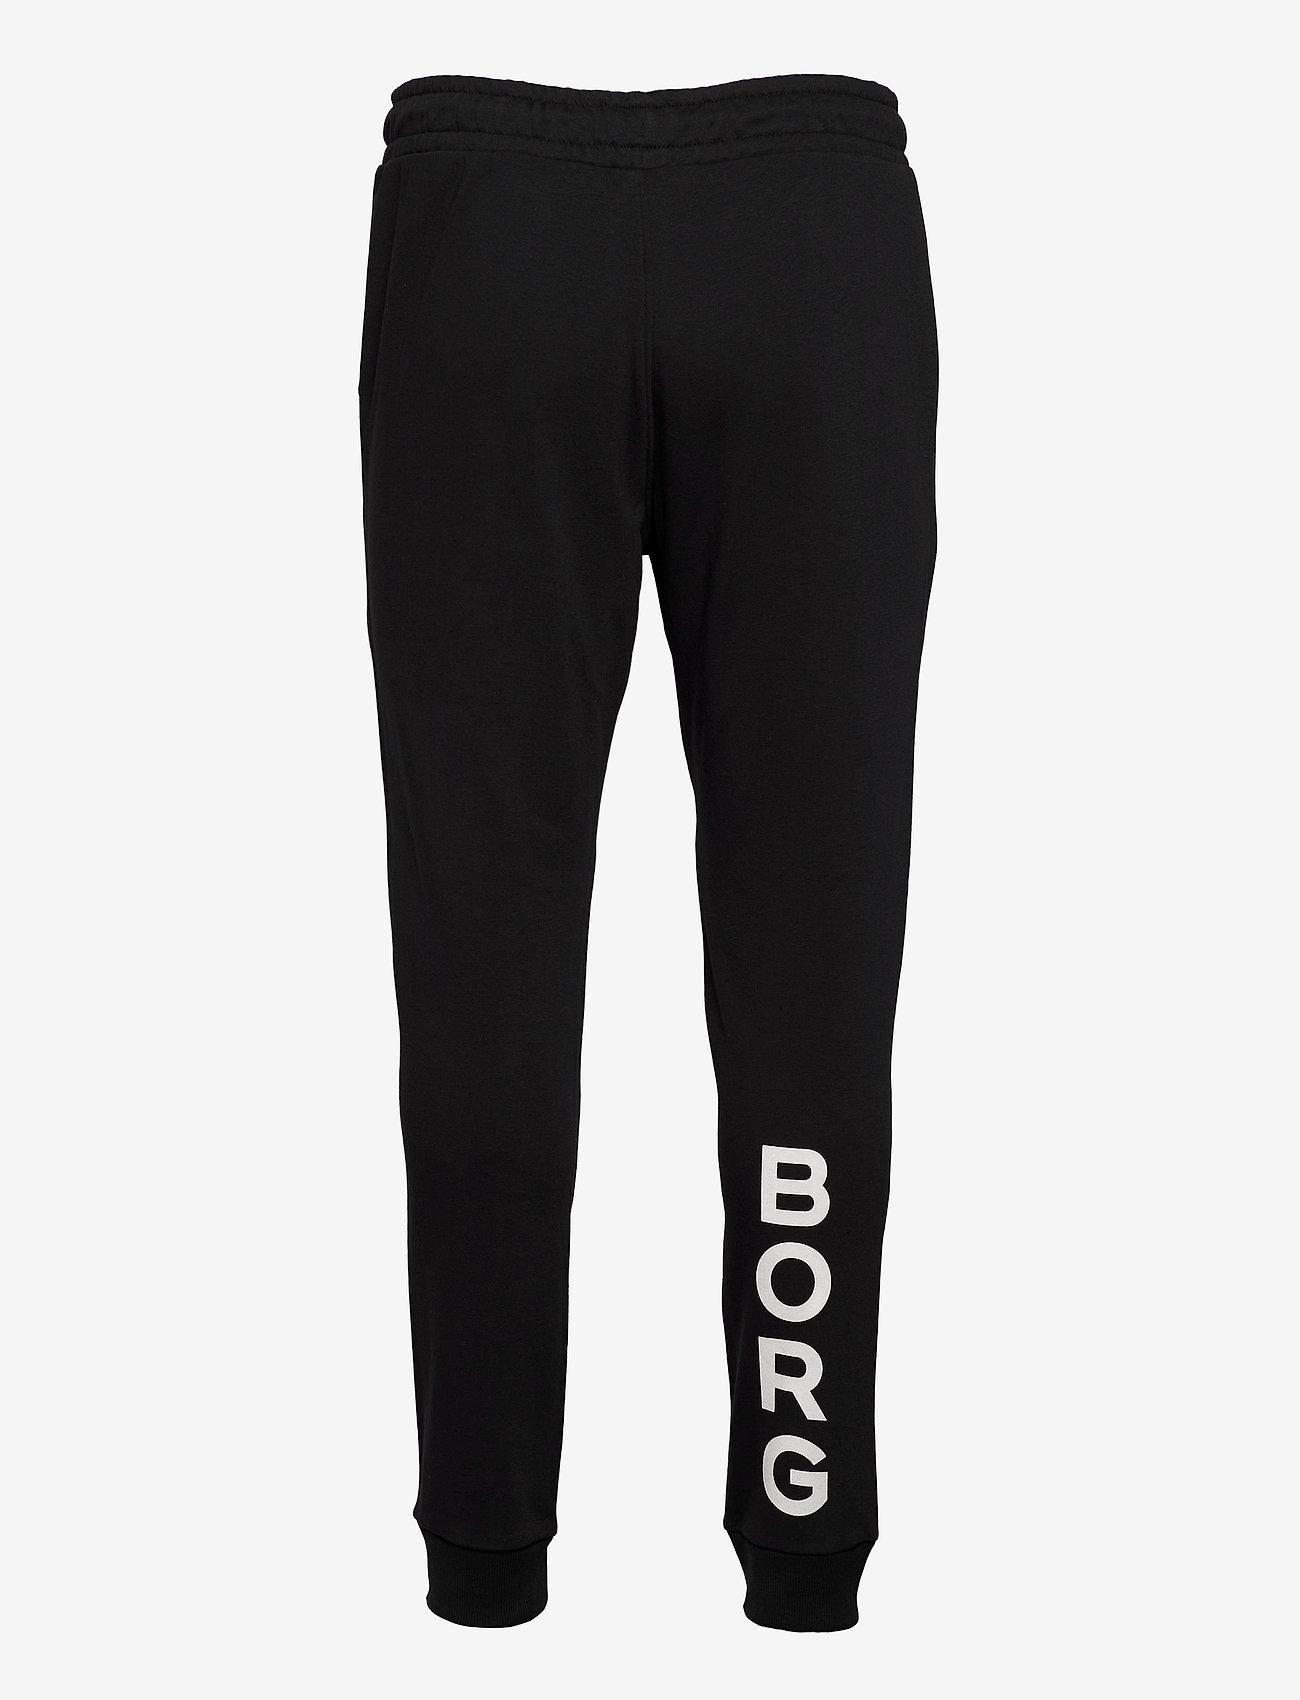 Björn Borg - PANTS SAMUEL SAMUEL - pants - black beauty - 1